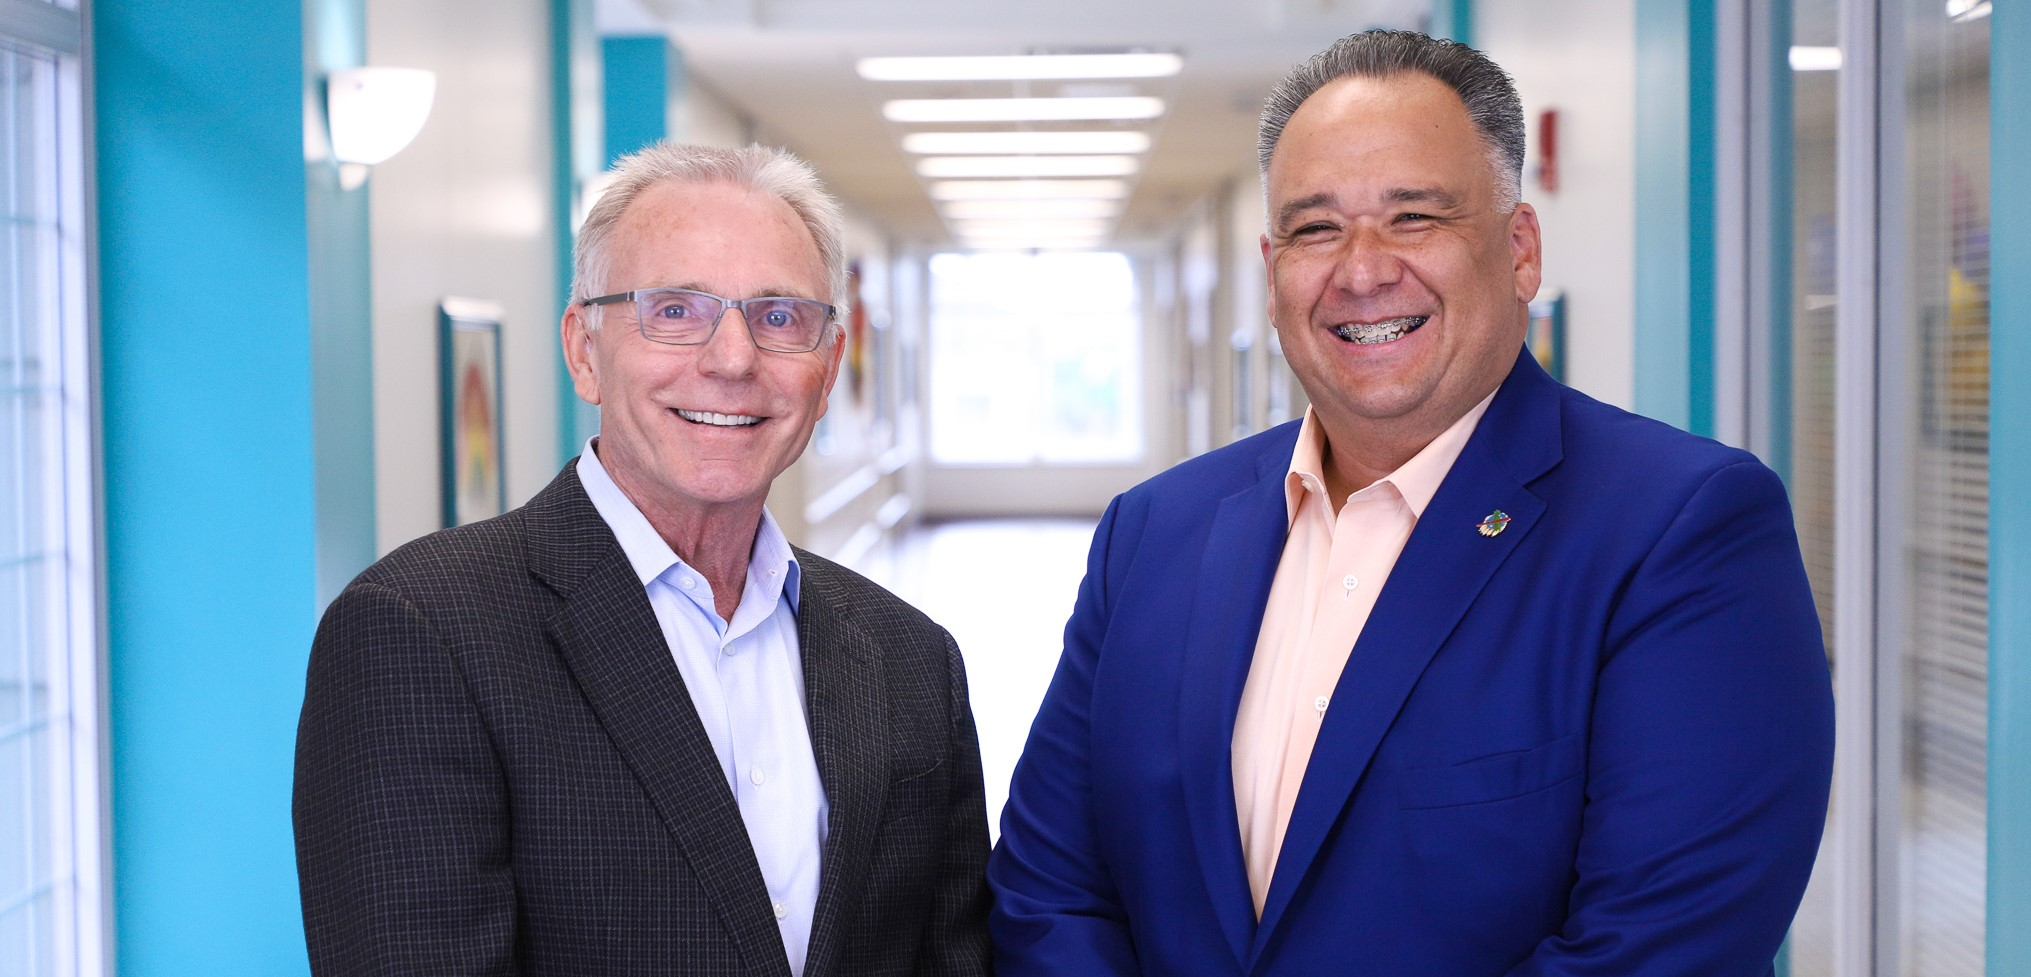 Hospital leadership changes take effect